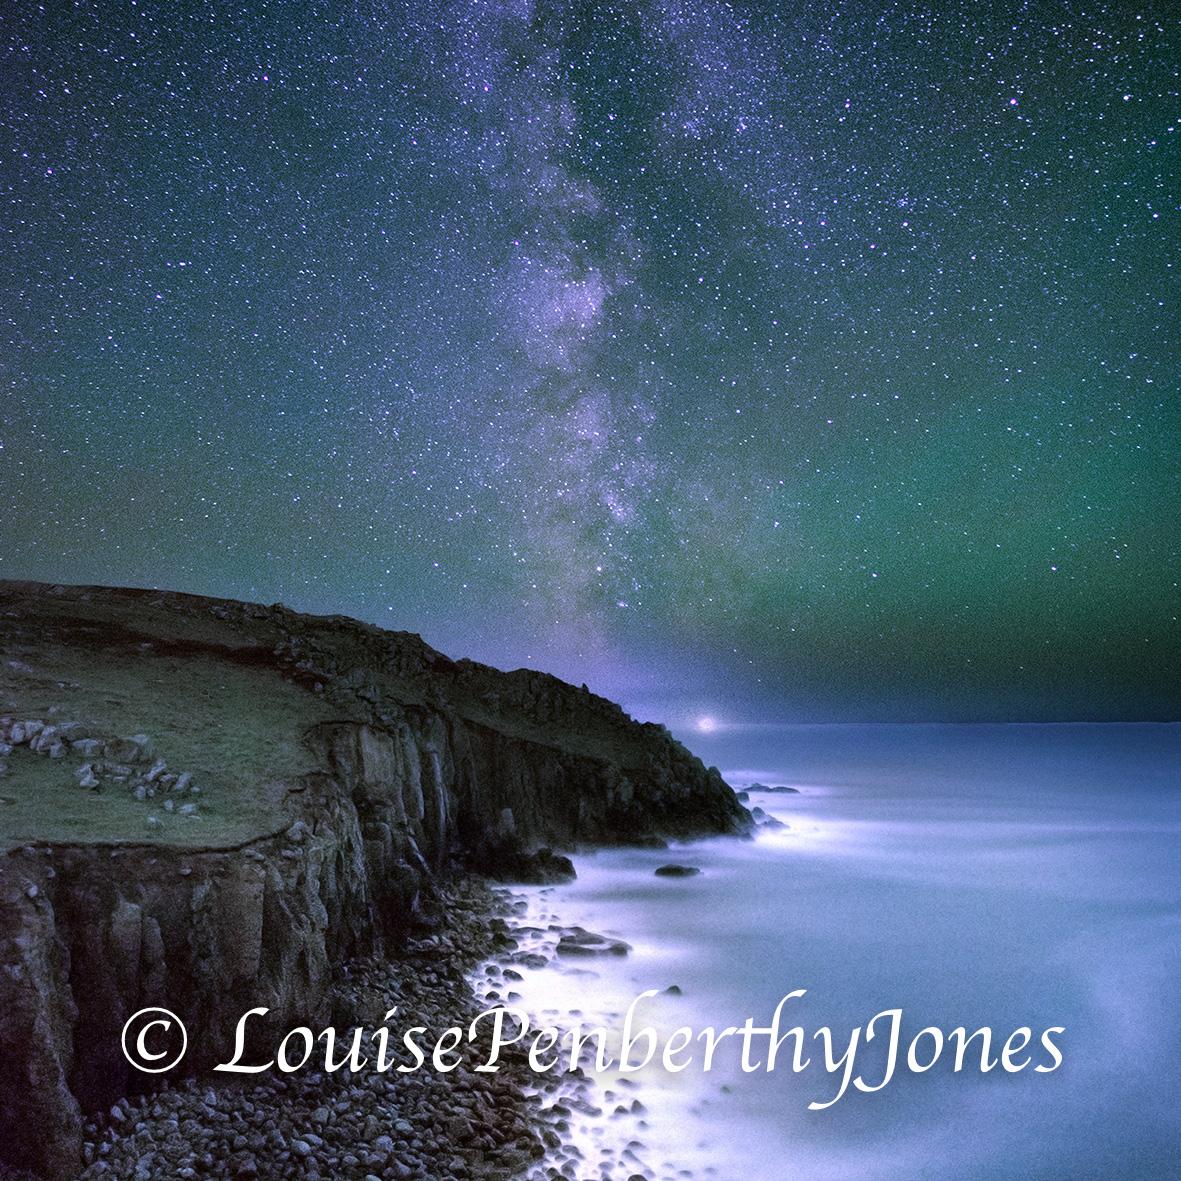 Milky Way over porthgwarra square